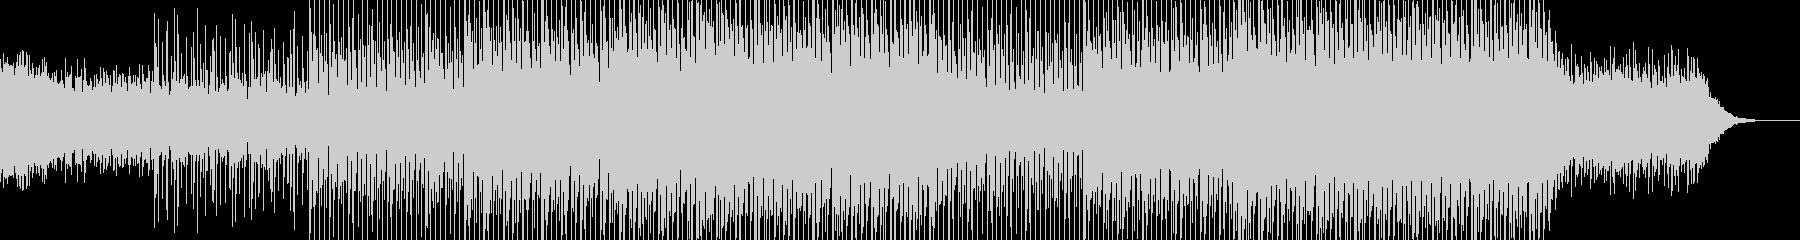 EDMポップで明るいクラブ系-35の未再生の波形